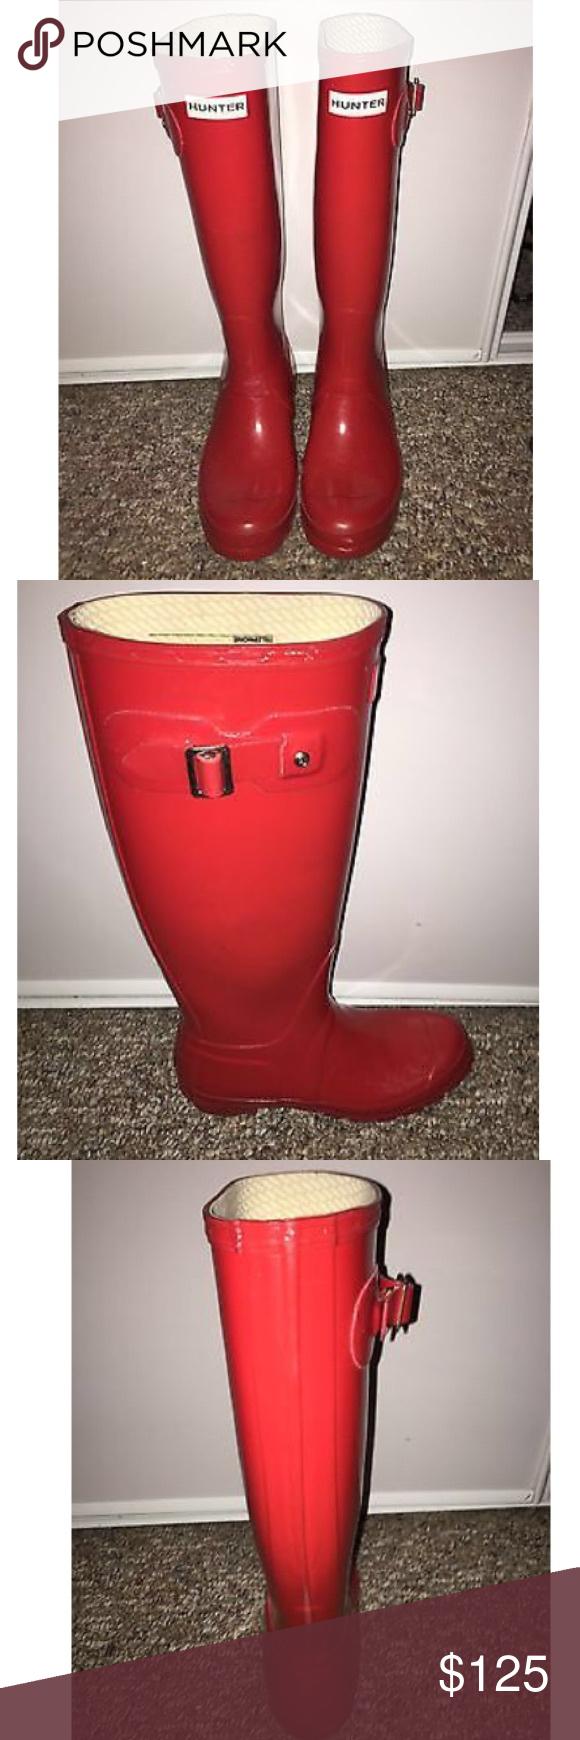 Hunter rain boots Red high gloss! Tall hunter rain boots Hunter Boots Shoes Winter & Rain Boots